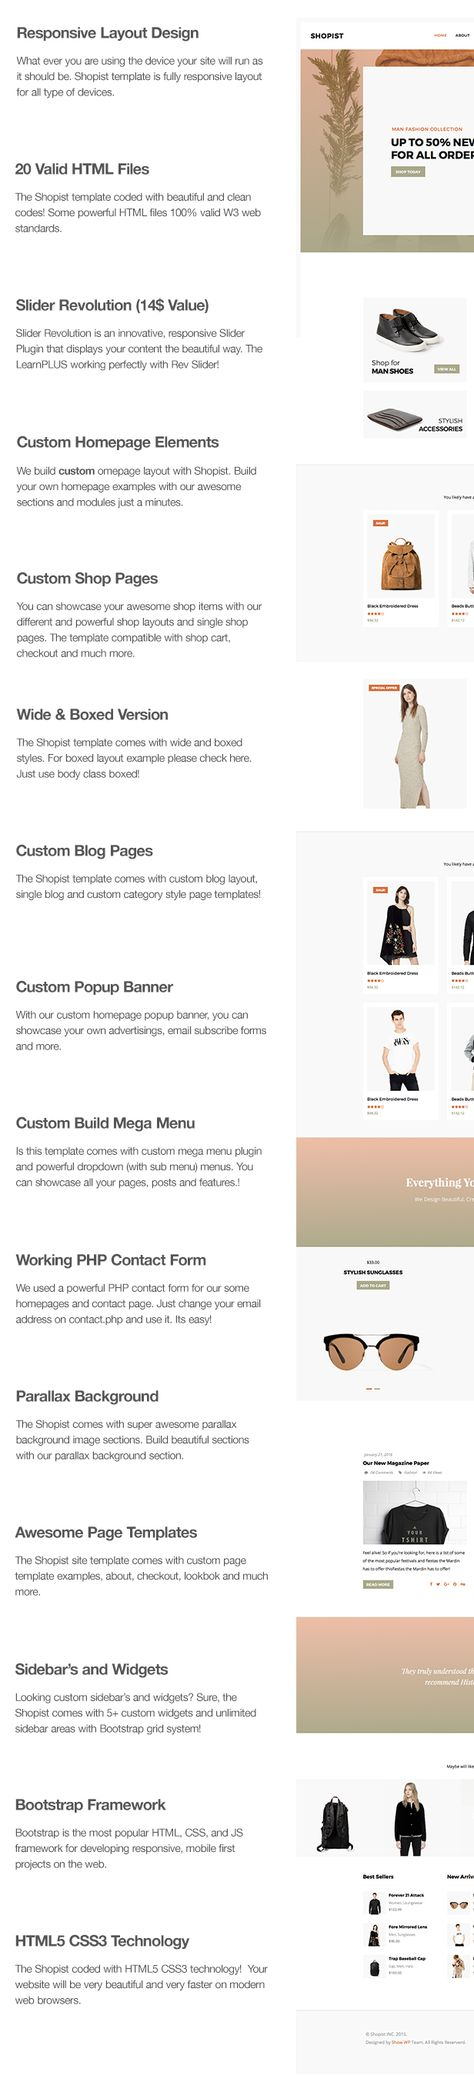 Shopist - Responsive Stylish Site eCommerce Template